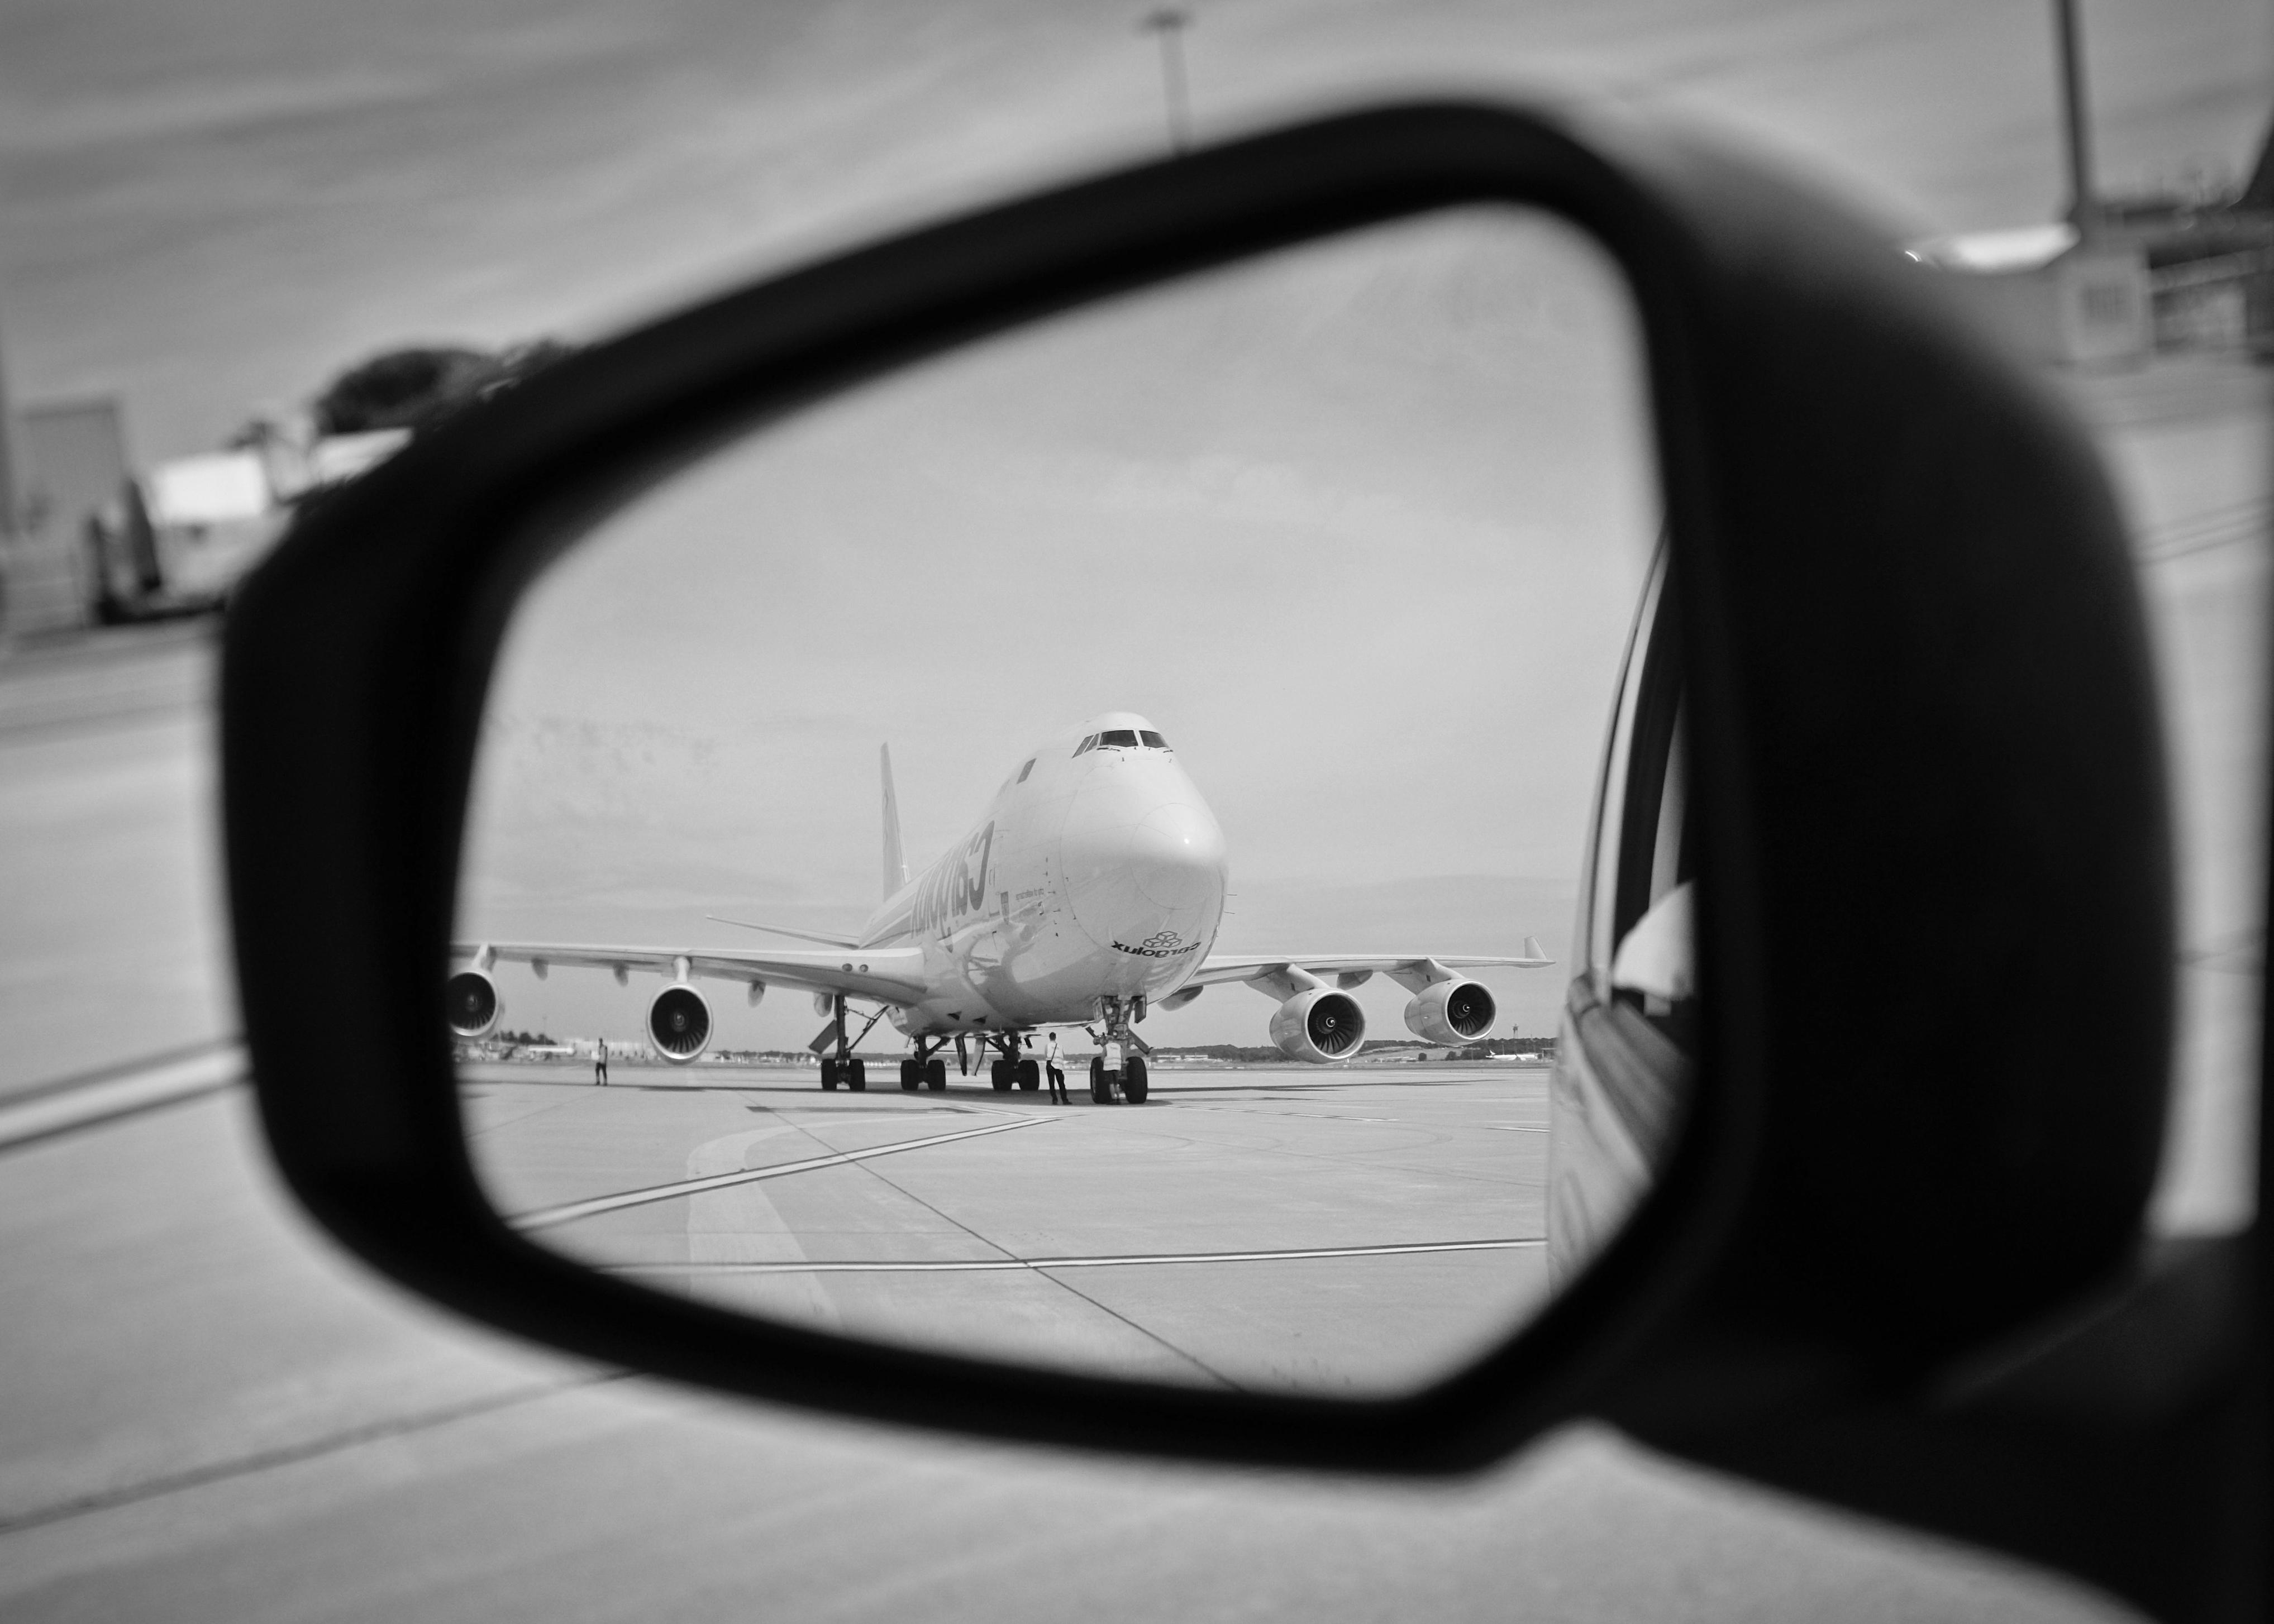 Filature - Boeing 747-400